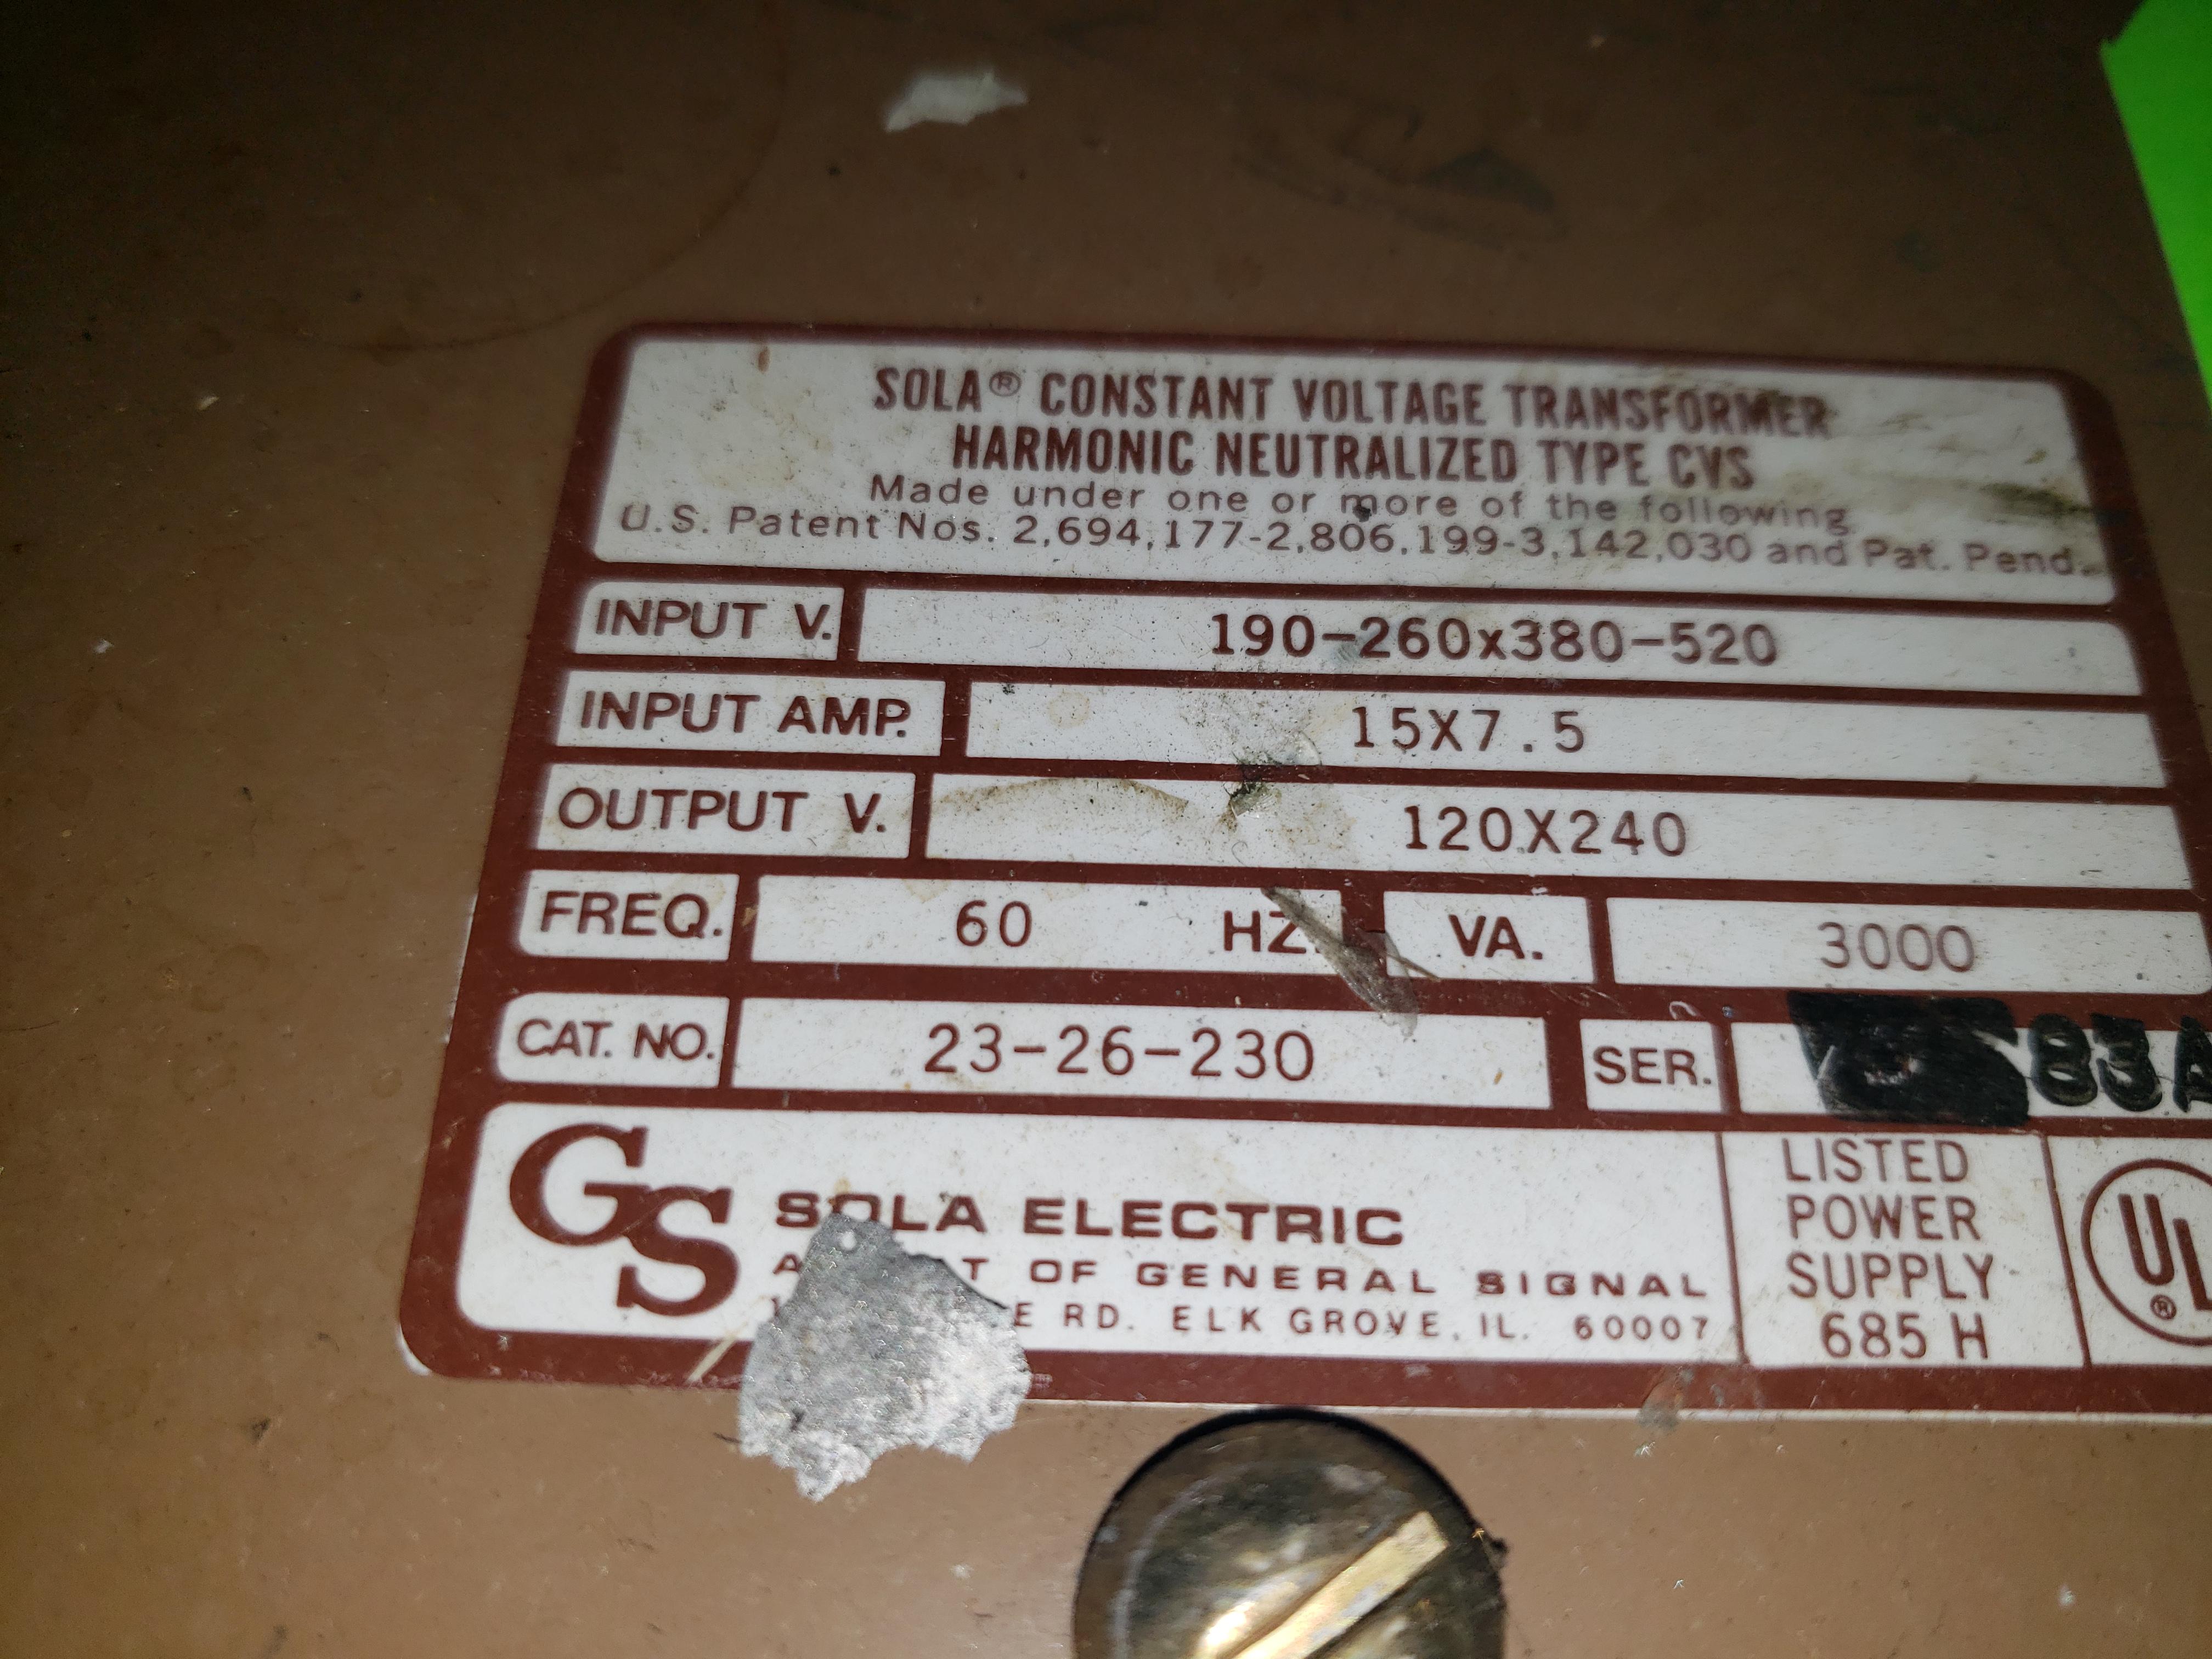 Lot 32 - SOLA CONSTANT VOLTAGE TRANSFORMER TYPE-CVS INPUT-190-260-X380-520 INPUT AMP 15 X 7.5 OUTPUT 120 X